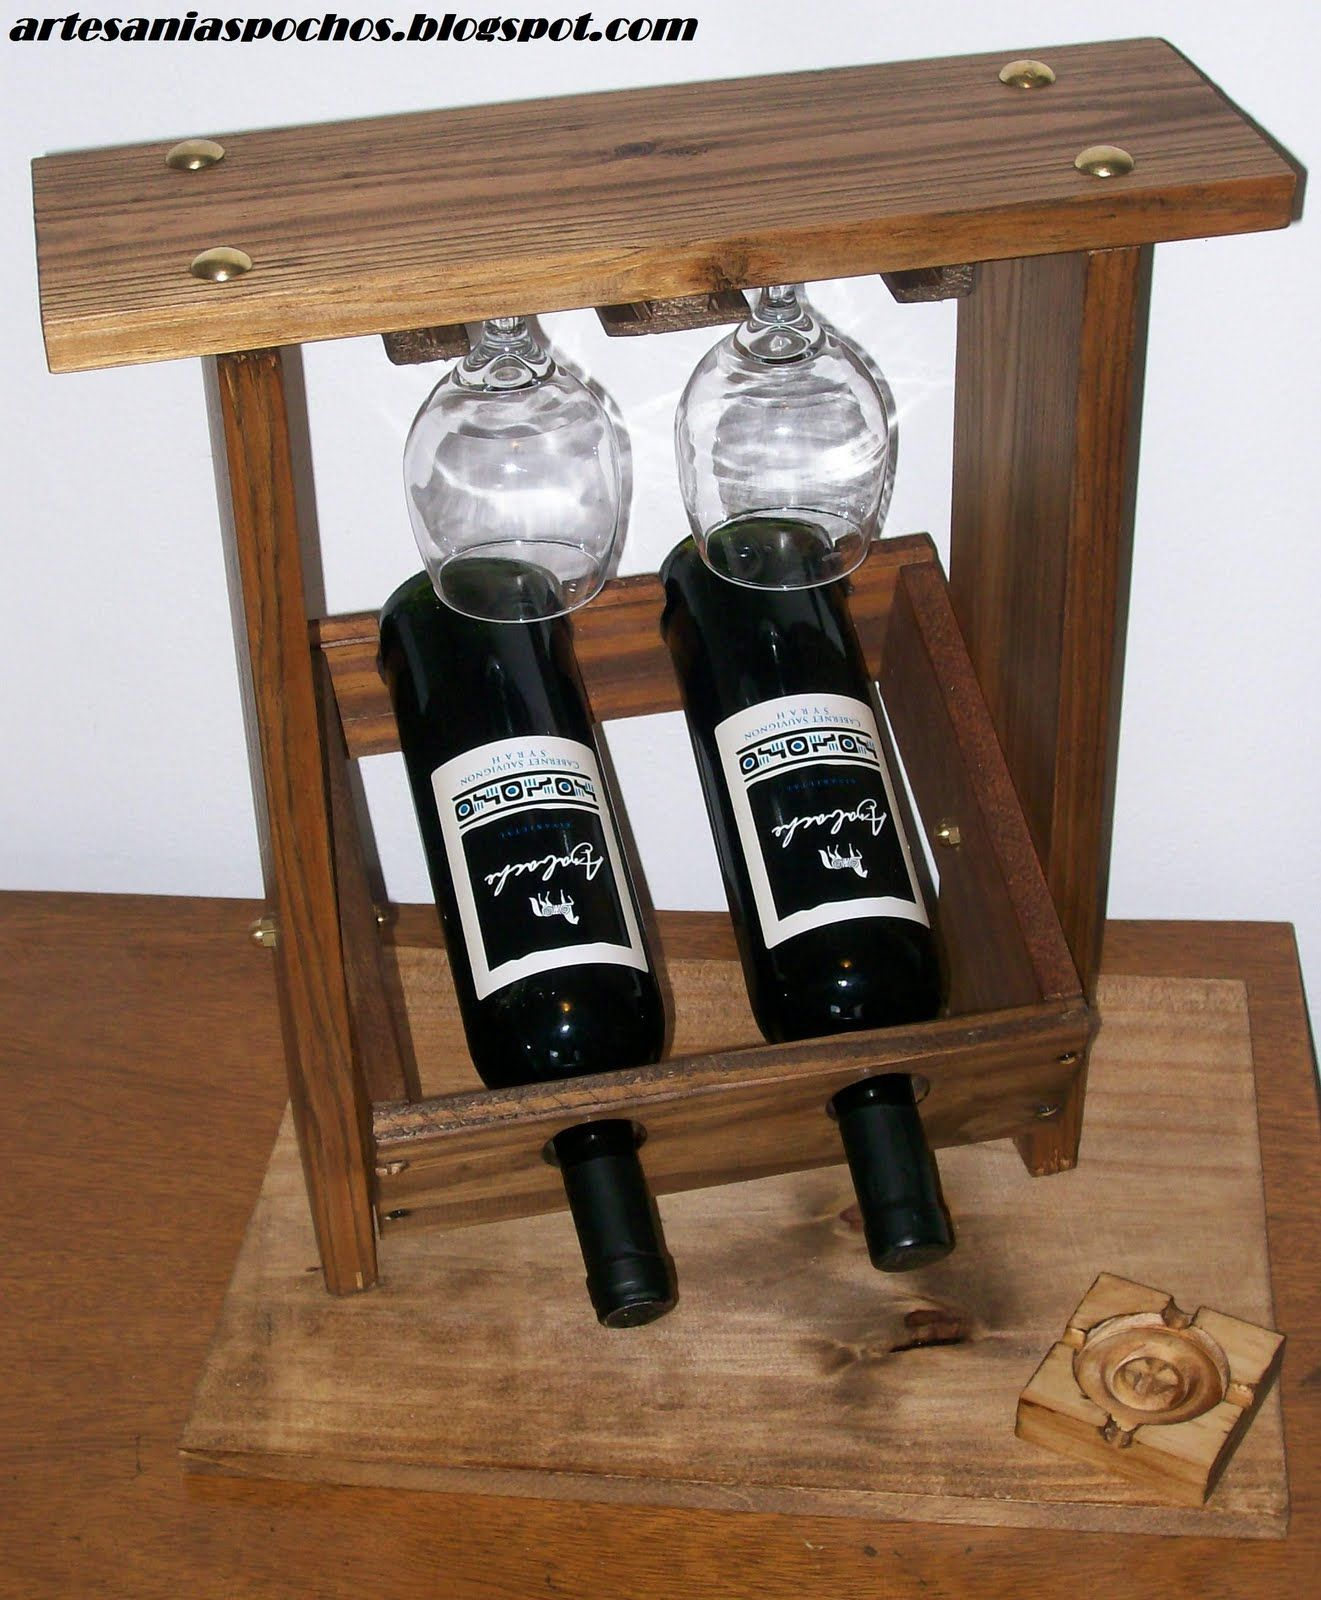 Hermosas vinotecas para dos botellas, con base o sin ella. Con ...